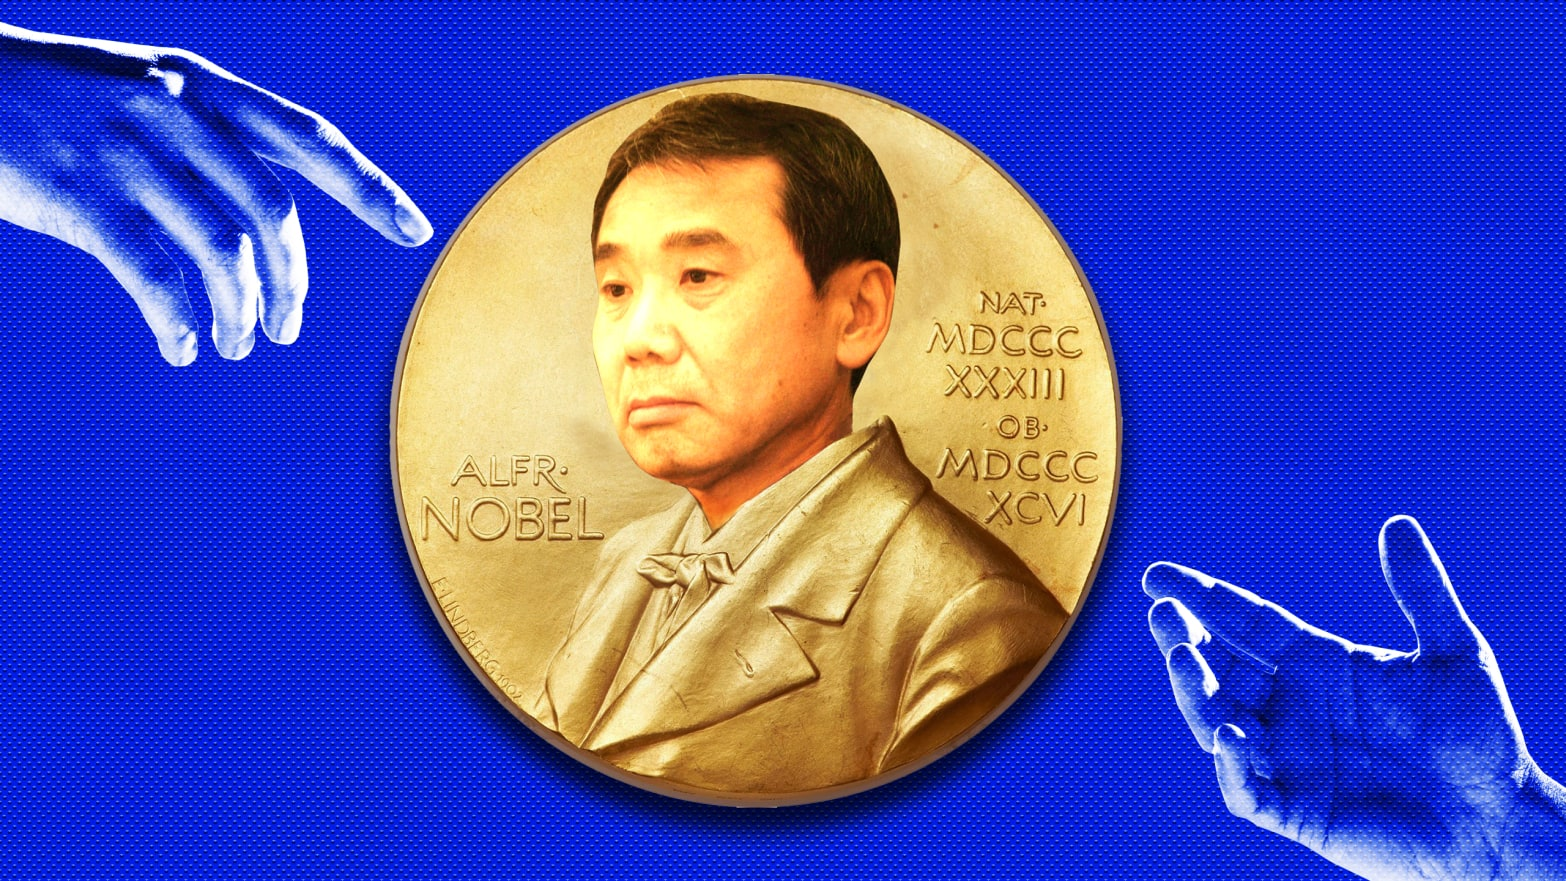 Will Haruki Murakami Finally Win the Nobel Prize?